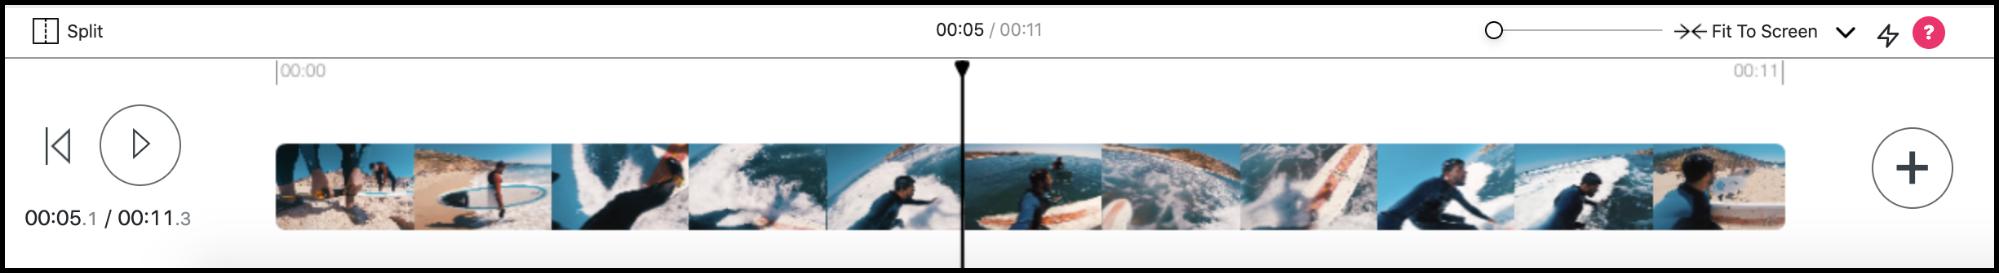 video timeline playhead